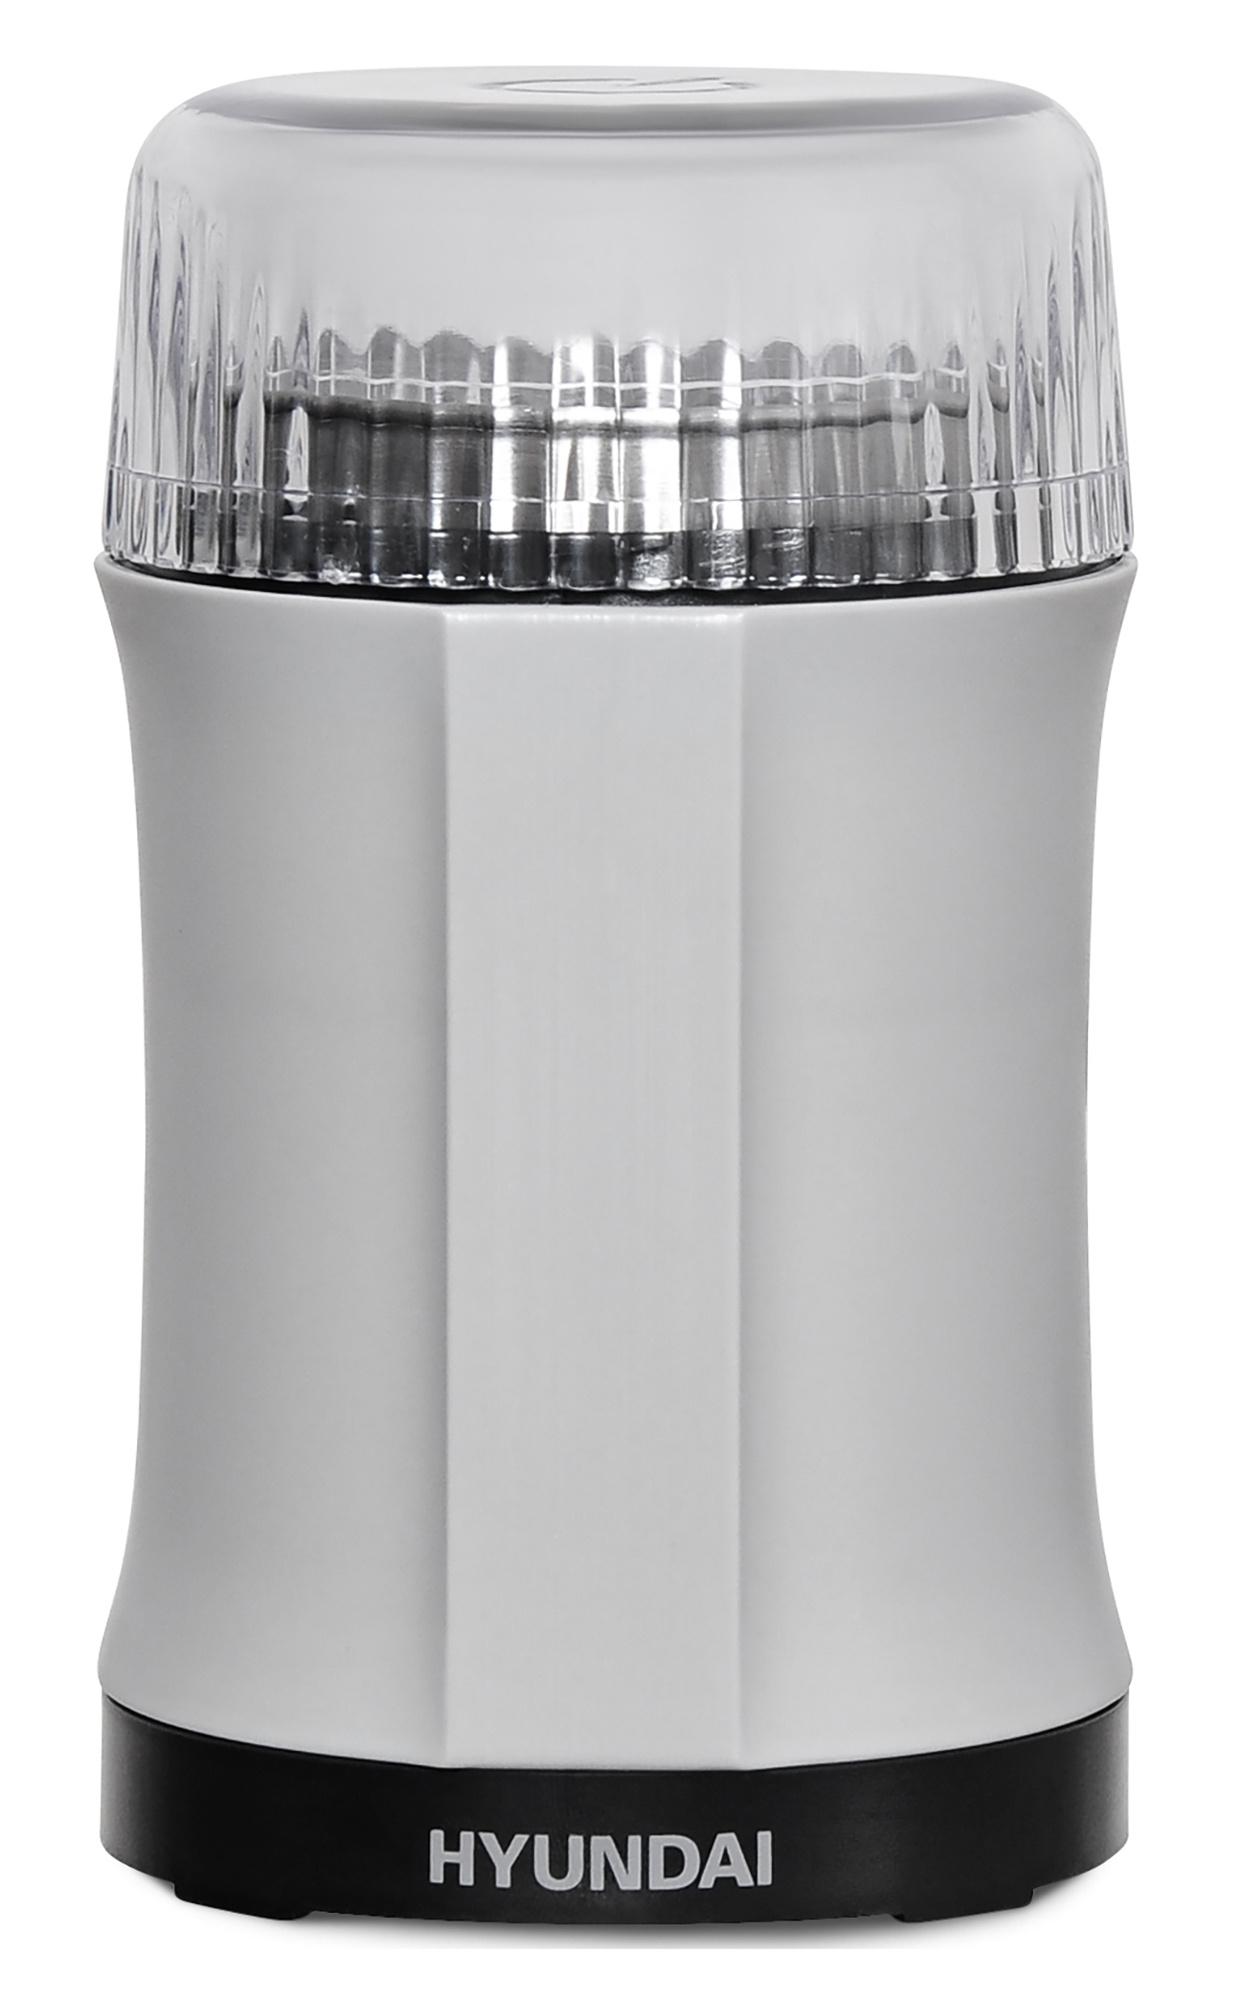 Кофемолка Hyundai HYC-G3241 200Вт сист.помол.:ротац.нож вместим.:40гр черный